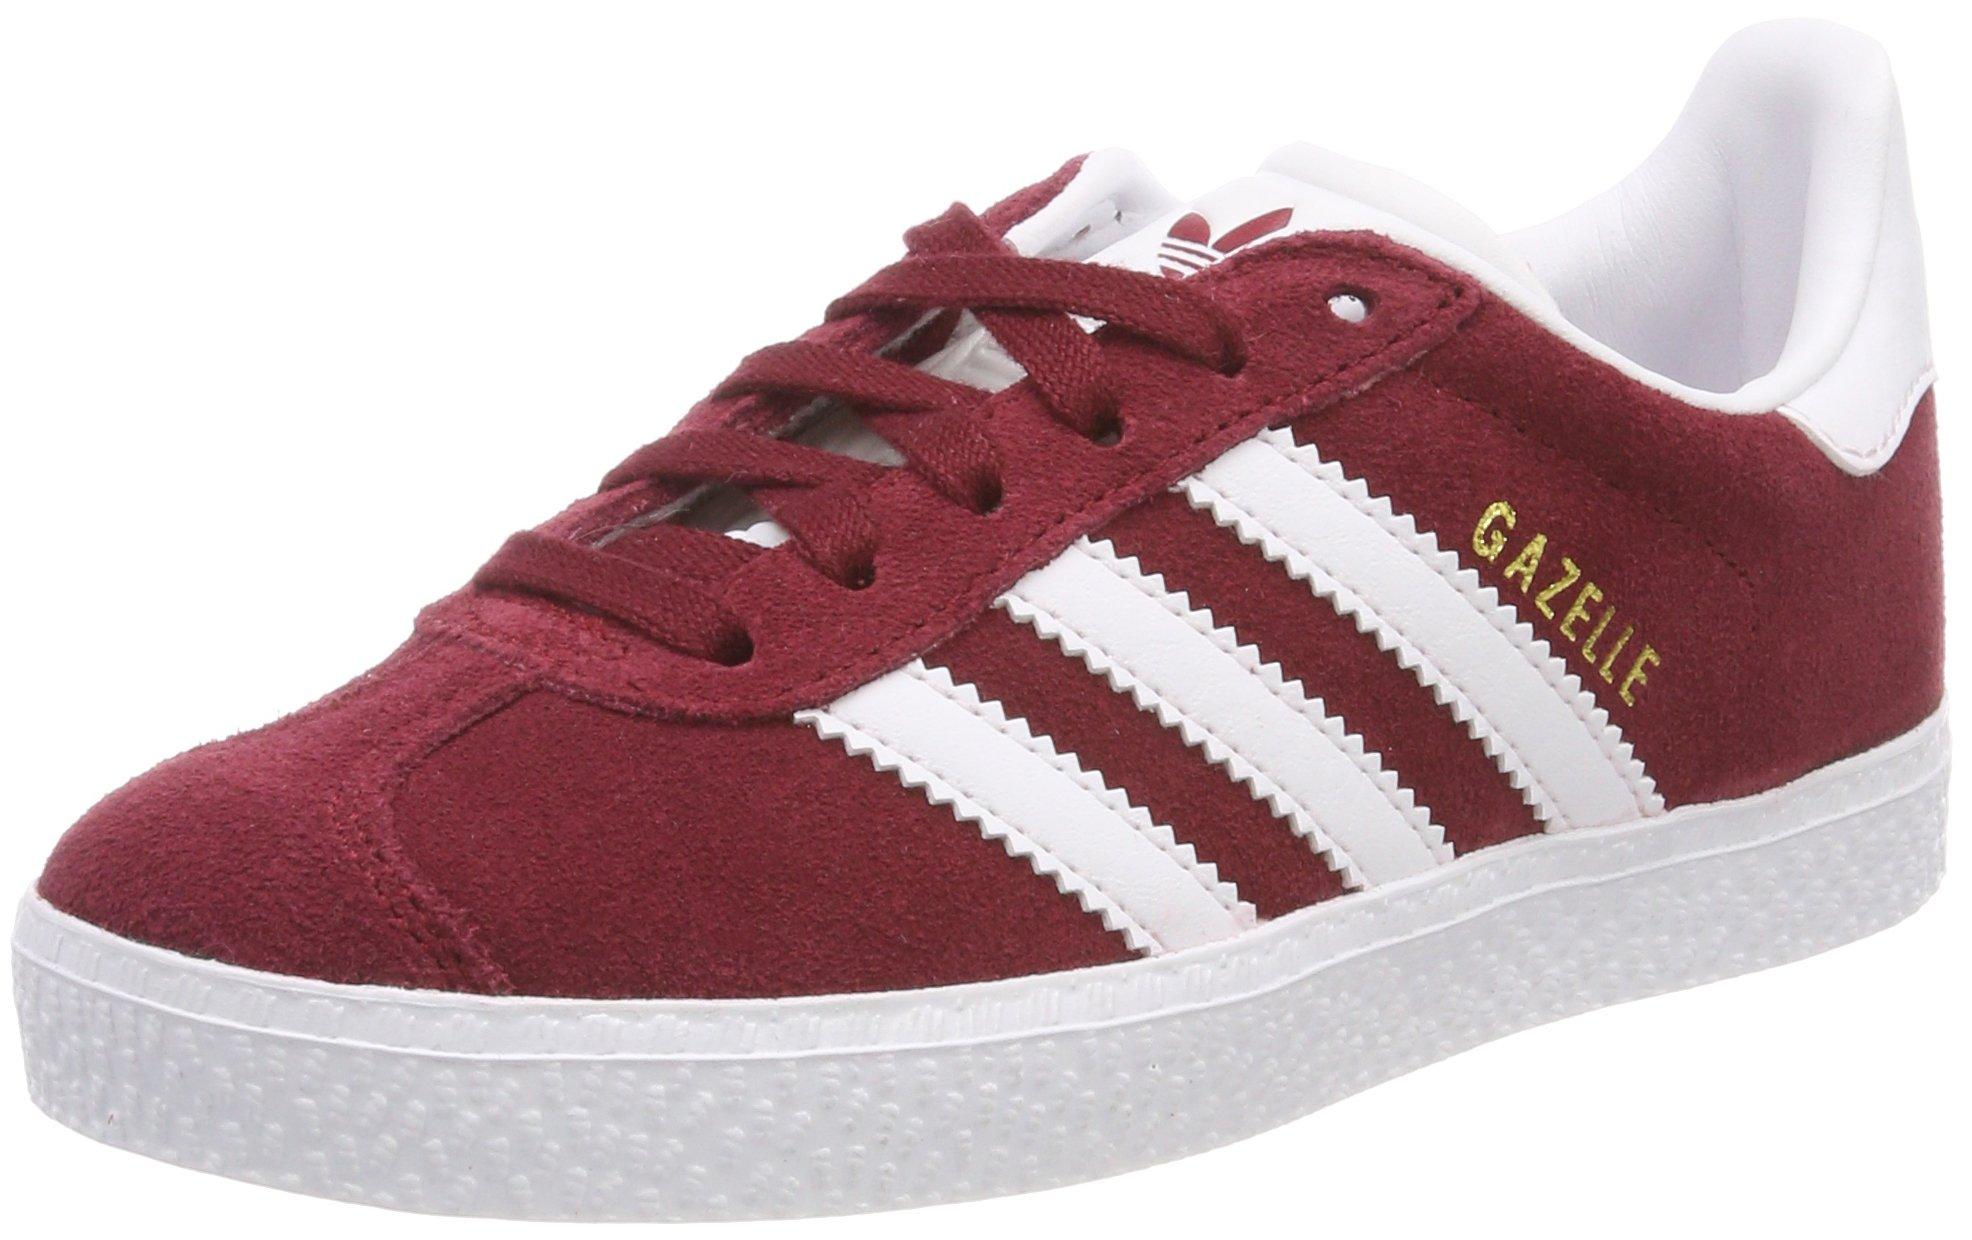 scarpe adidas rosse basse